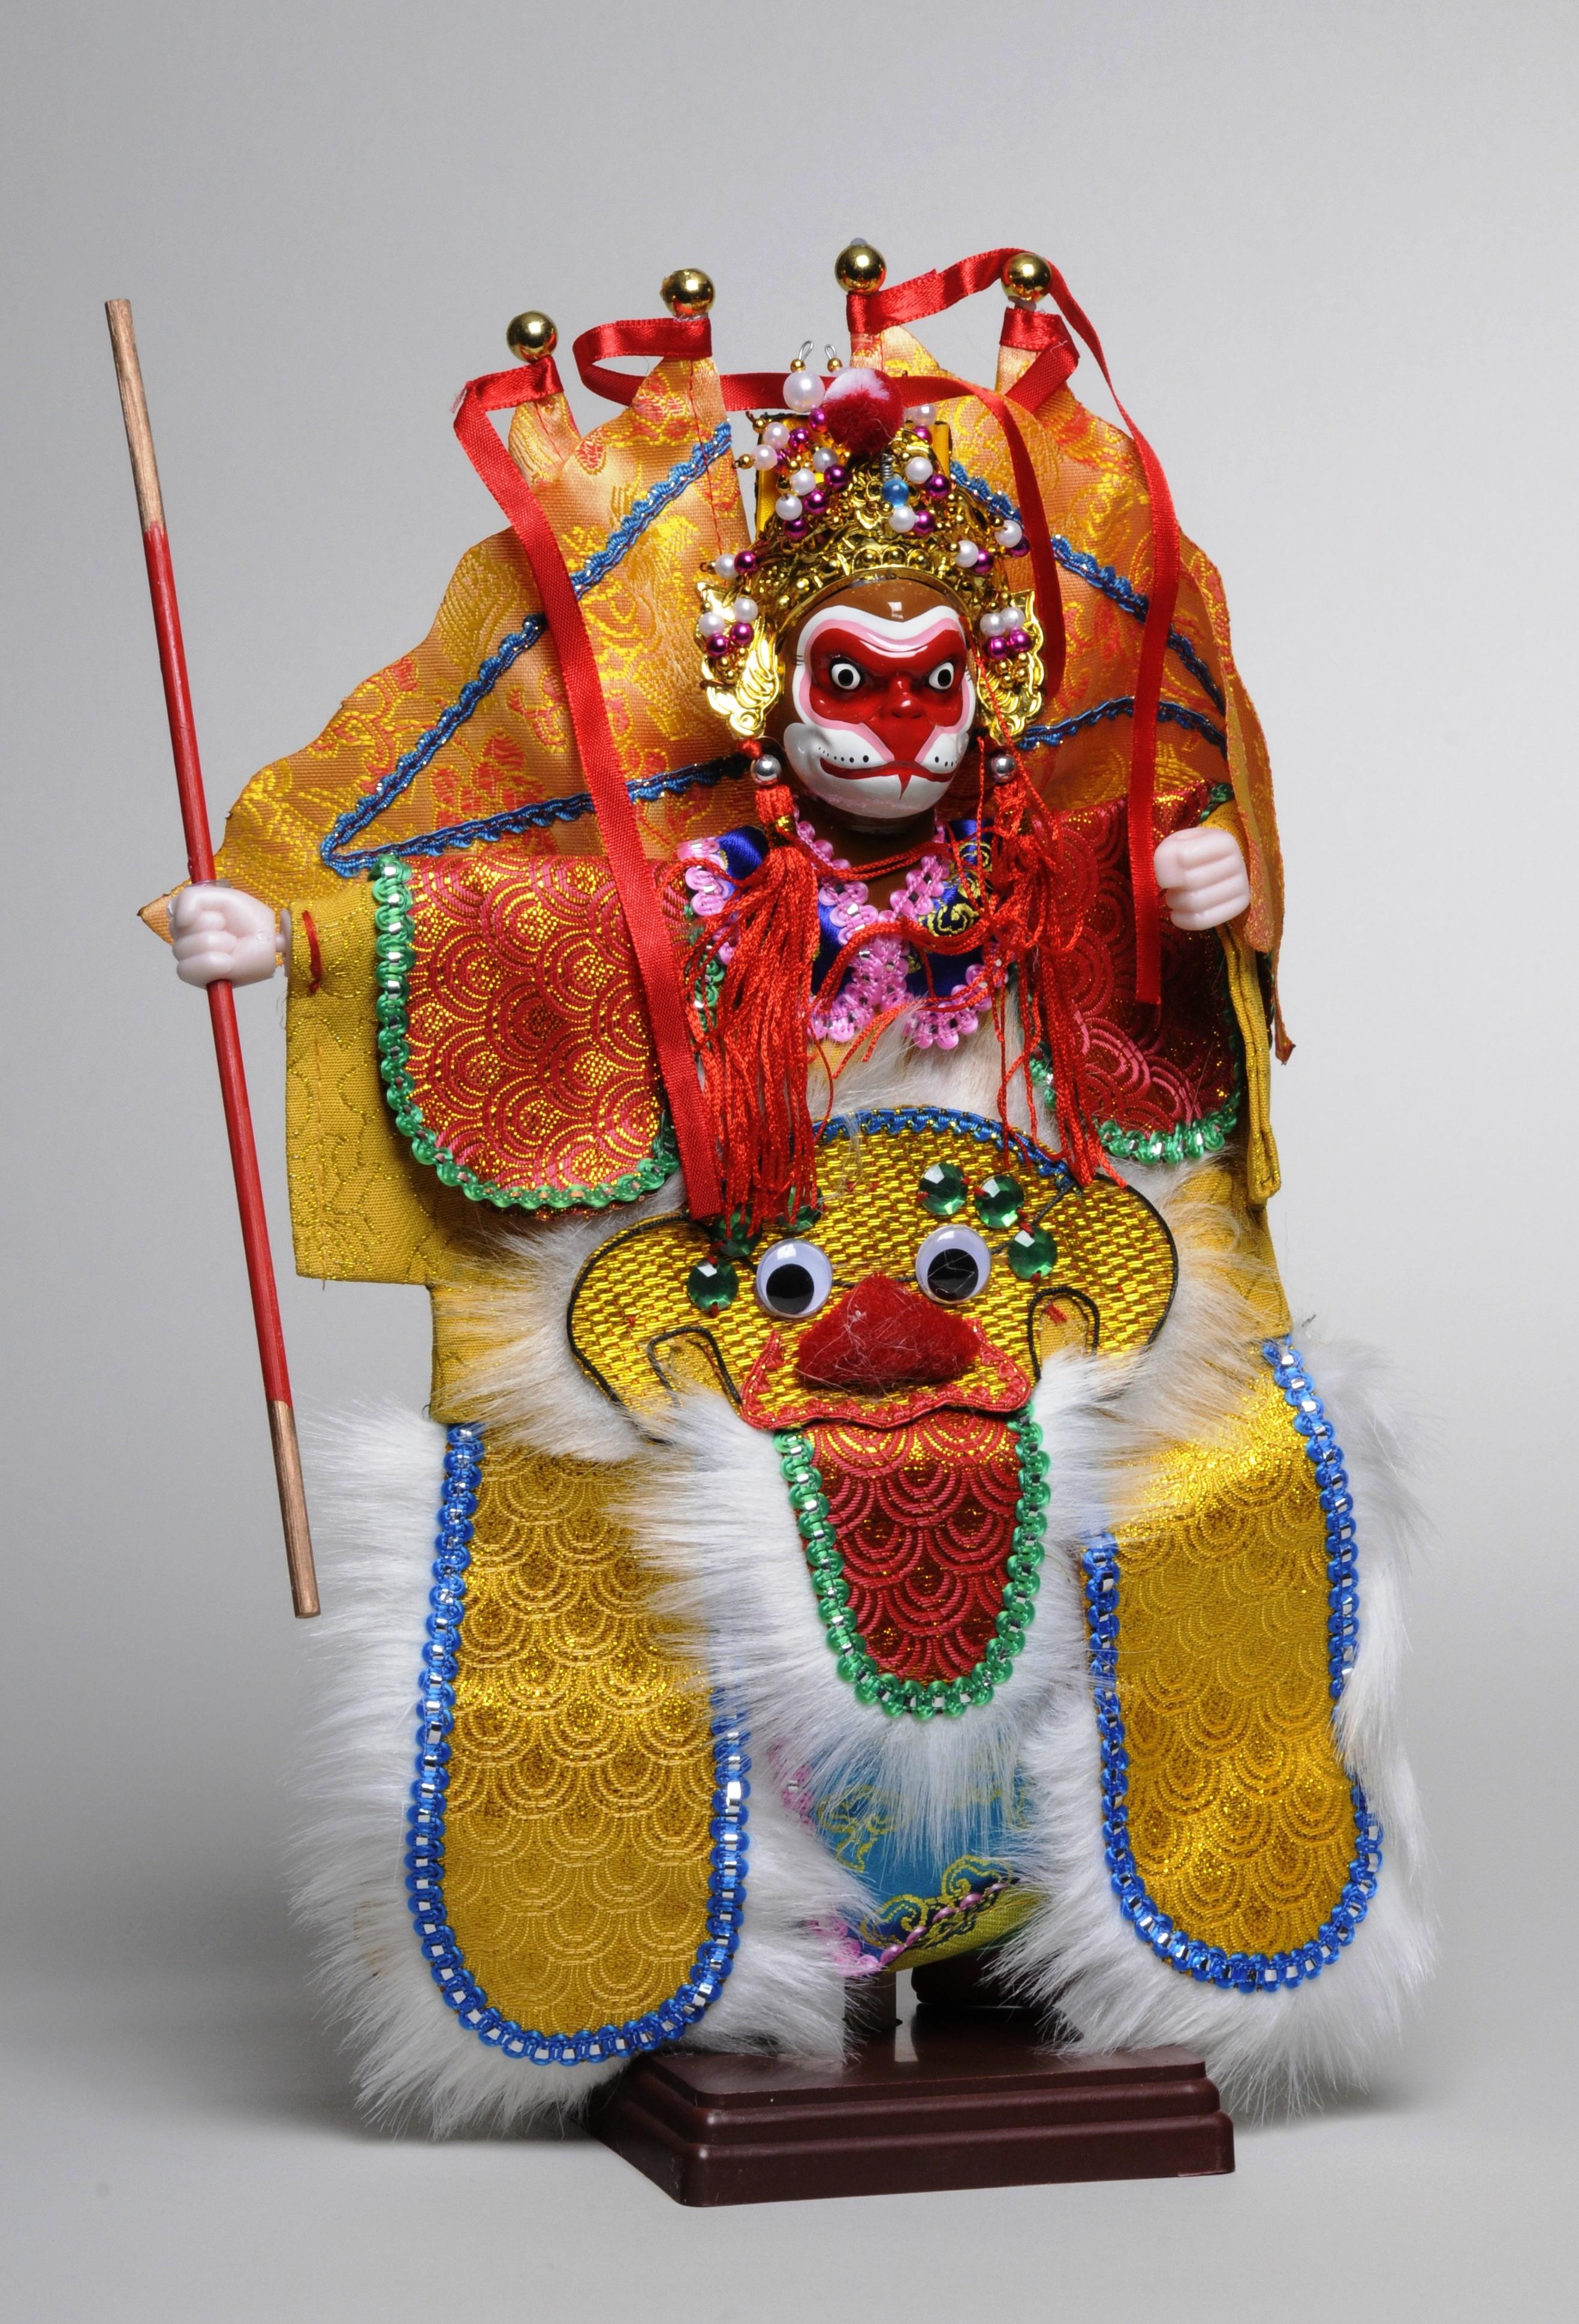 Chinese Monkey King Puppet